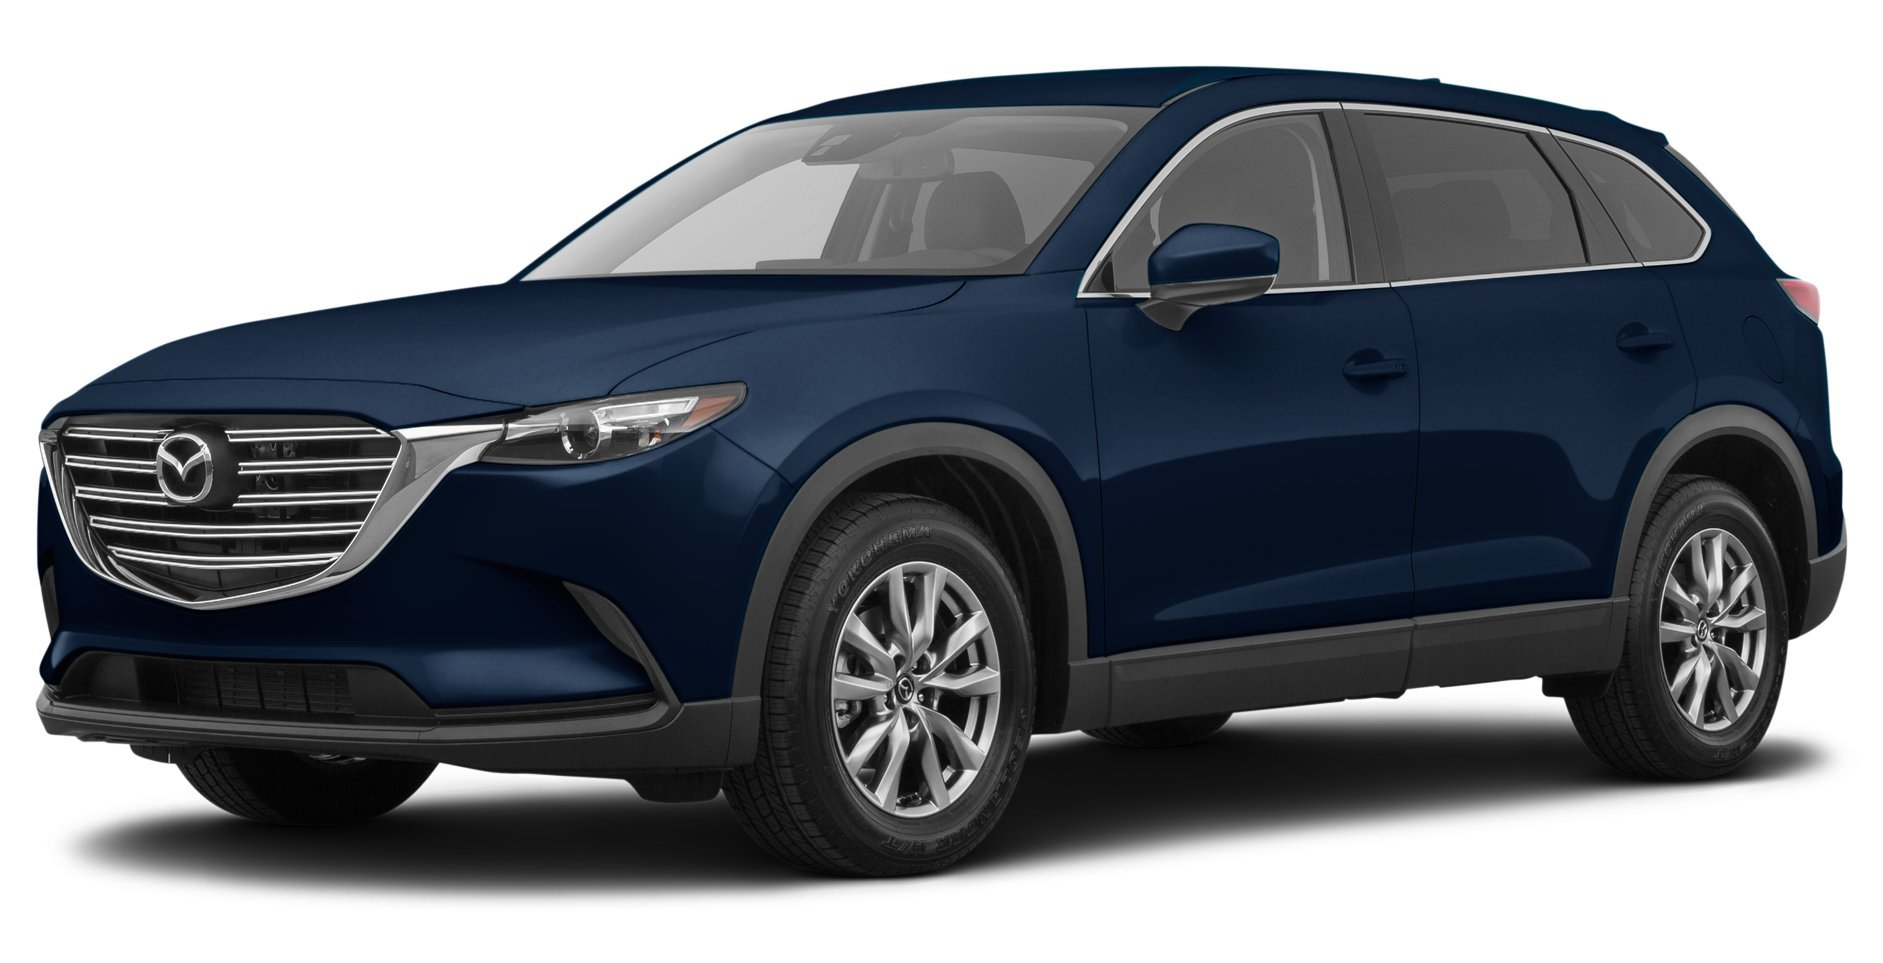 2017 Kia Sorento Configurations >> Amazon.com: 2017 Mazda CX-9 Reviews, Images, and Specs ...